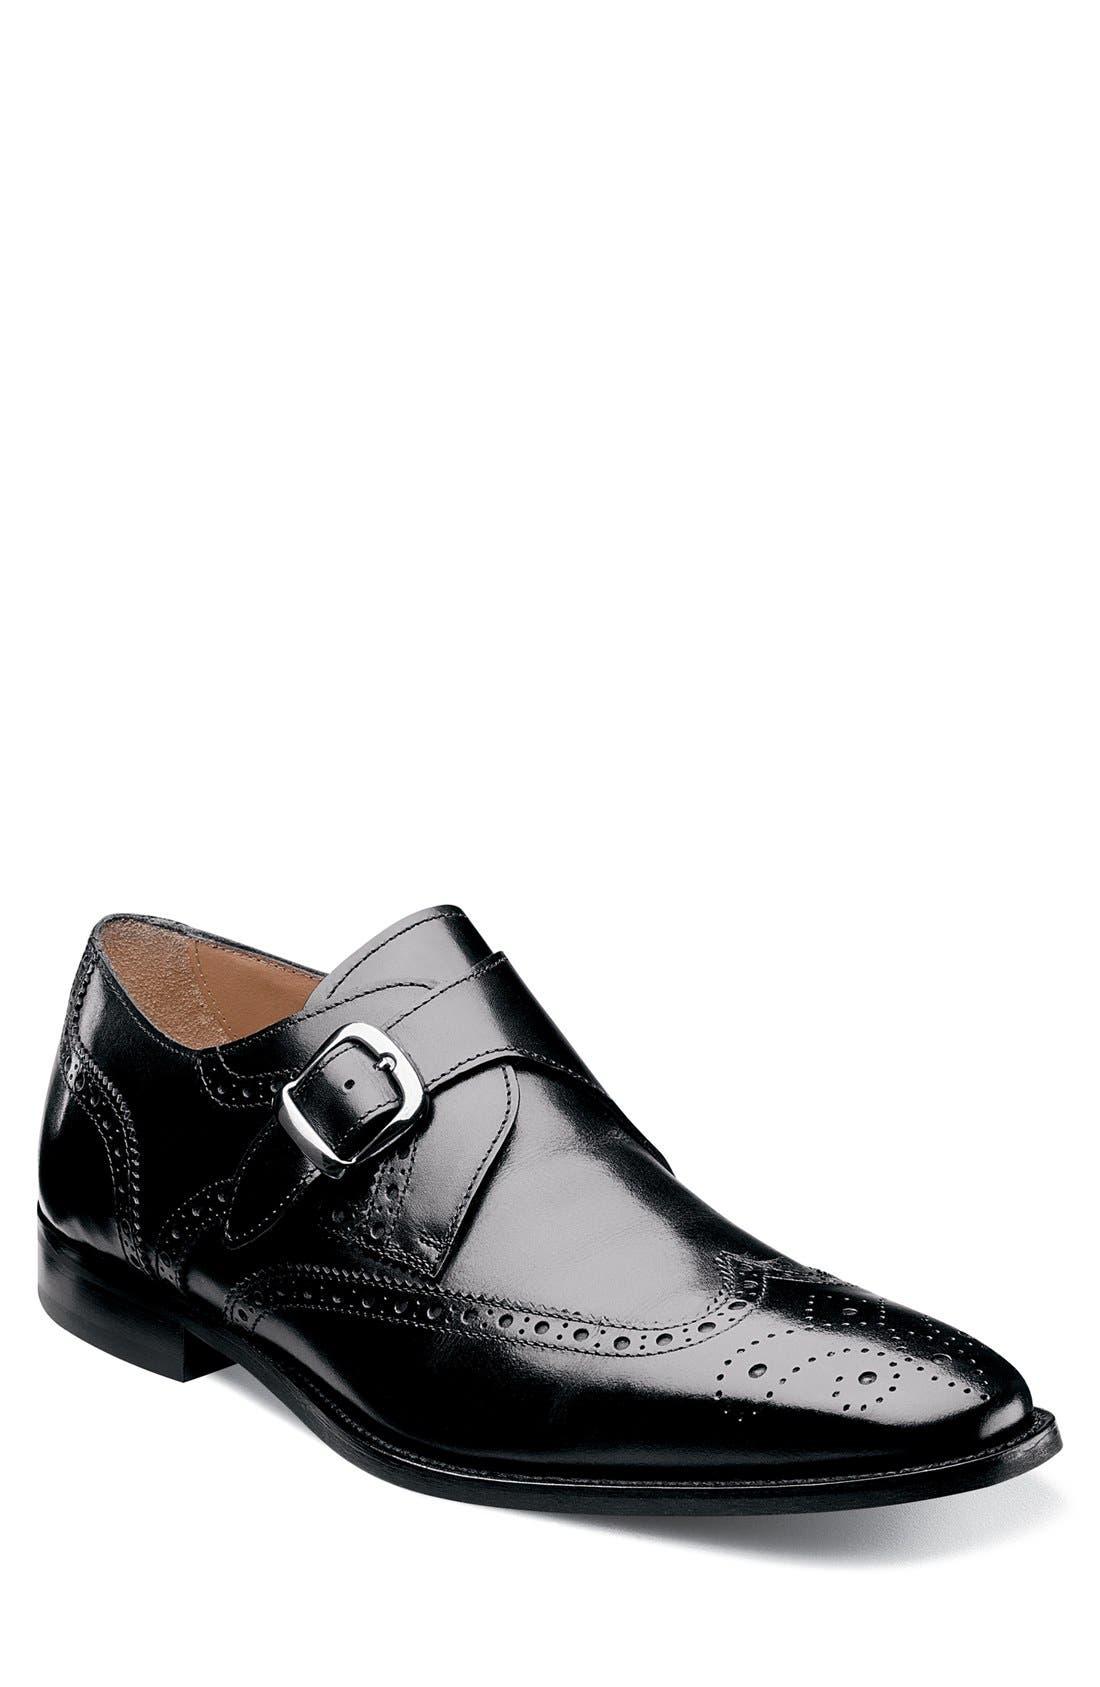 'Sabato' Wingtip Monk Strap Shoe,                             Main thumbnail 1, color,                             Black